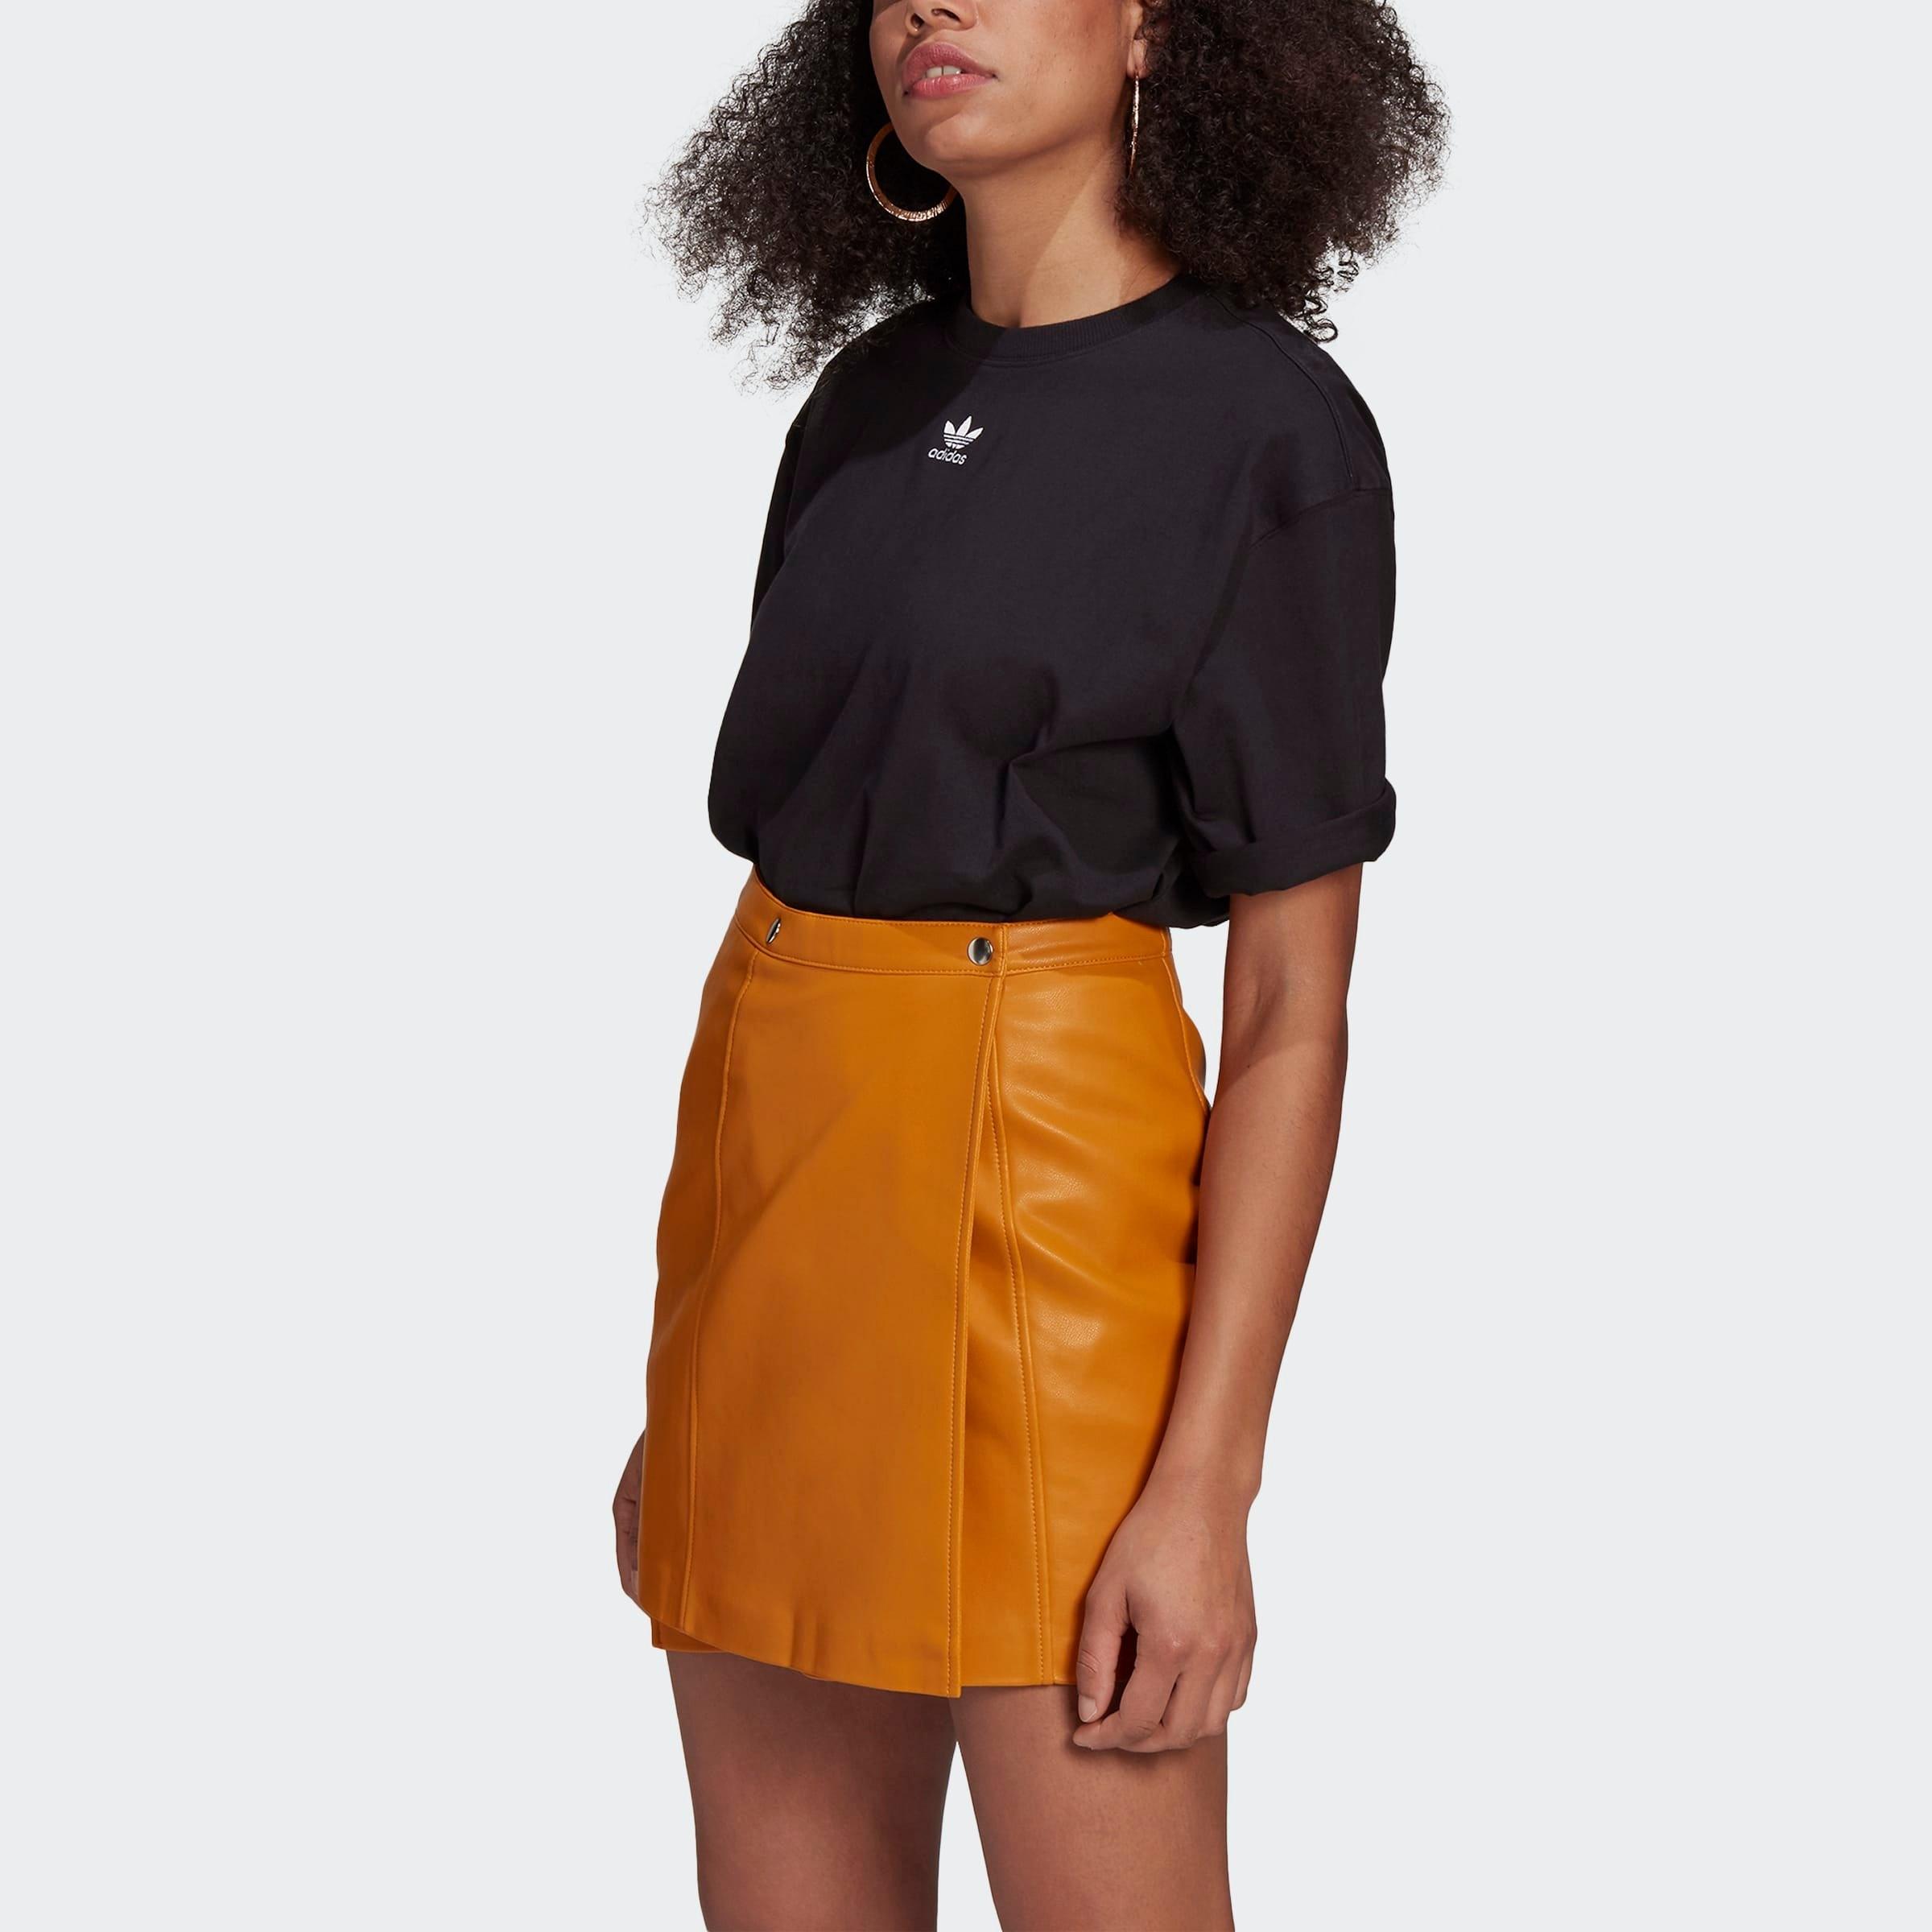 adidas Originals T-shirt »ADICOLOR ESSENTIALS« in de webshop van OTTO kopen